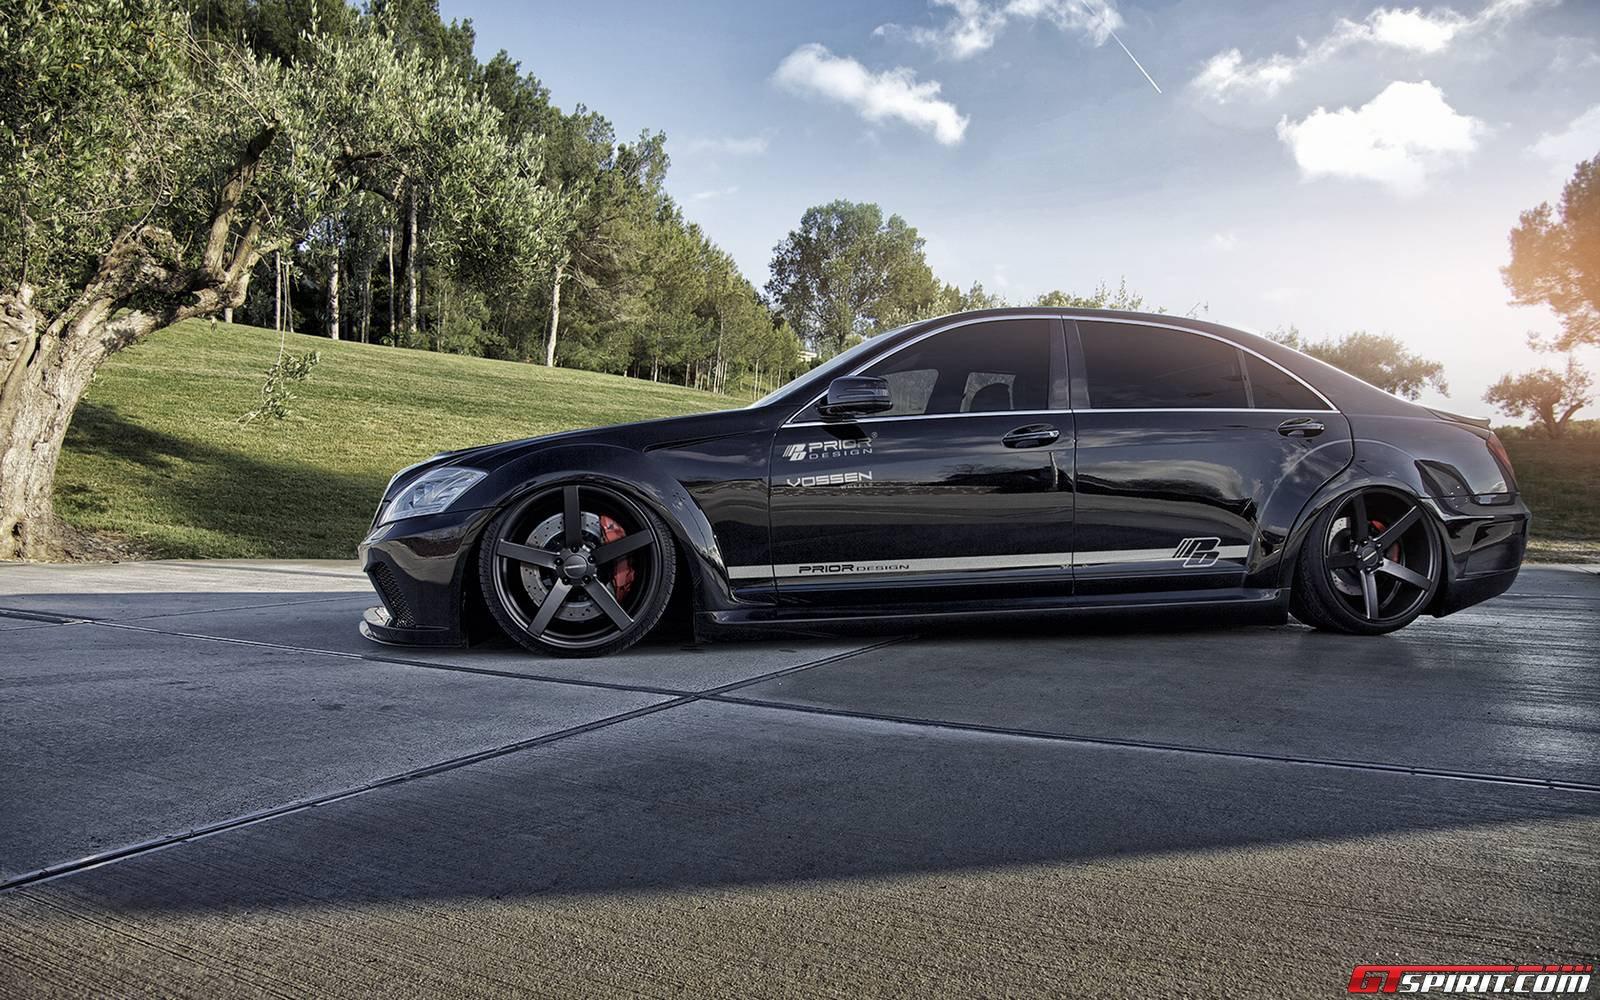 mercedes benz s class v2 widebody black edition by prior design supercar - Mercedes Benz 2014 S Class Black